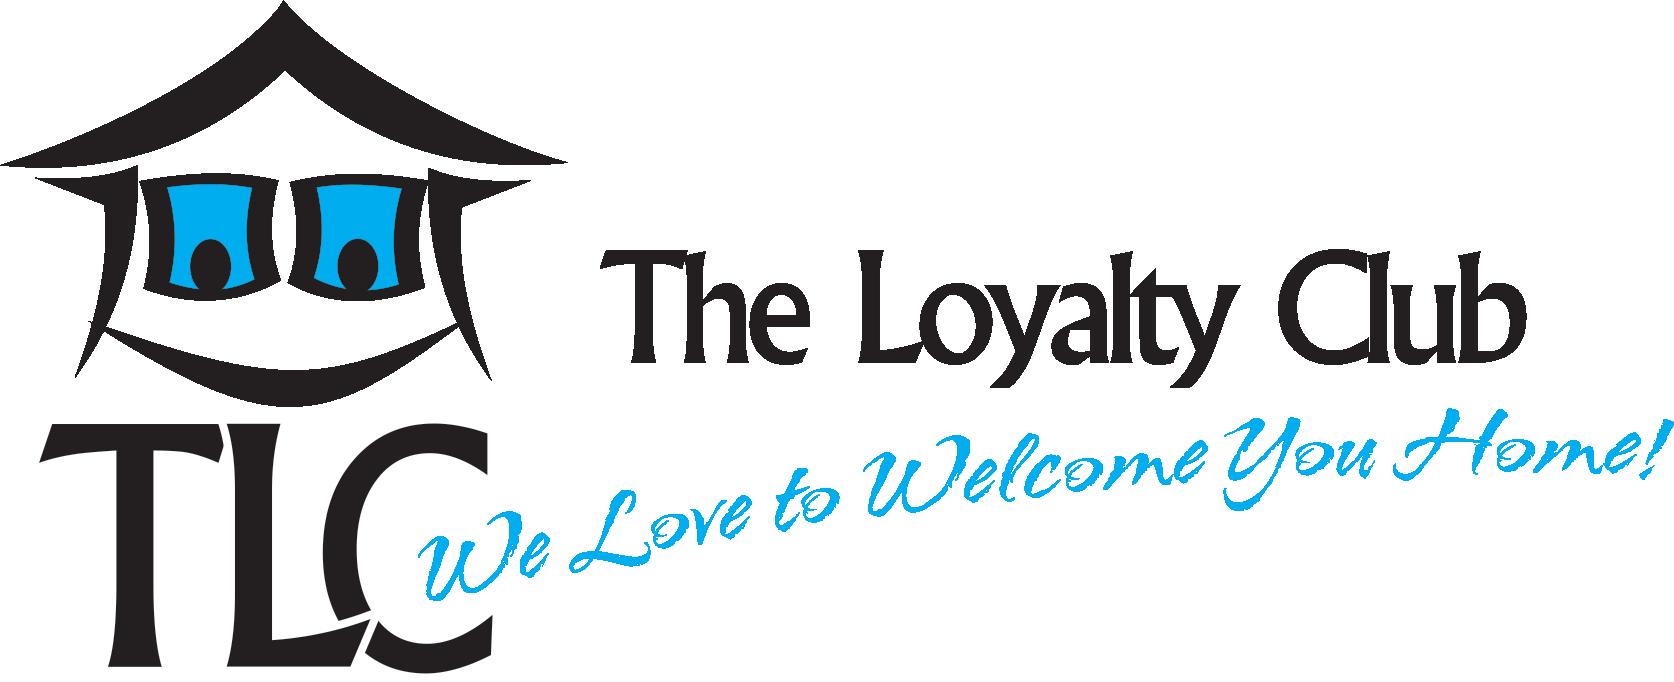 Loyalty Club Names